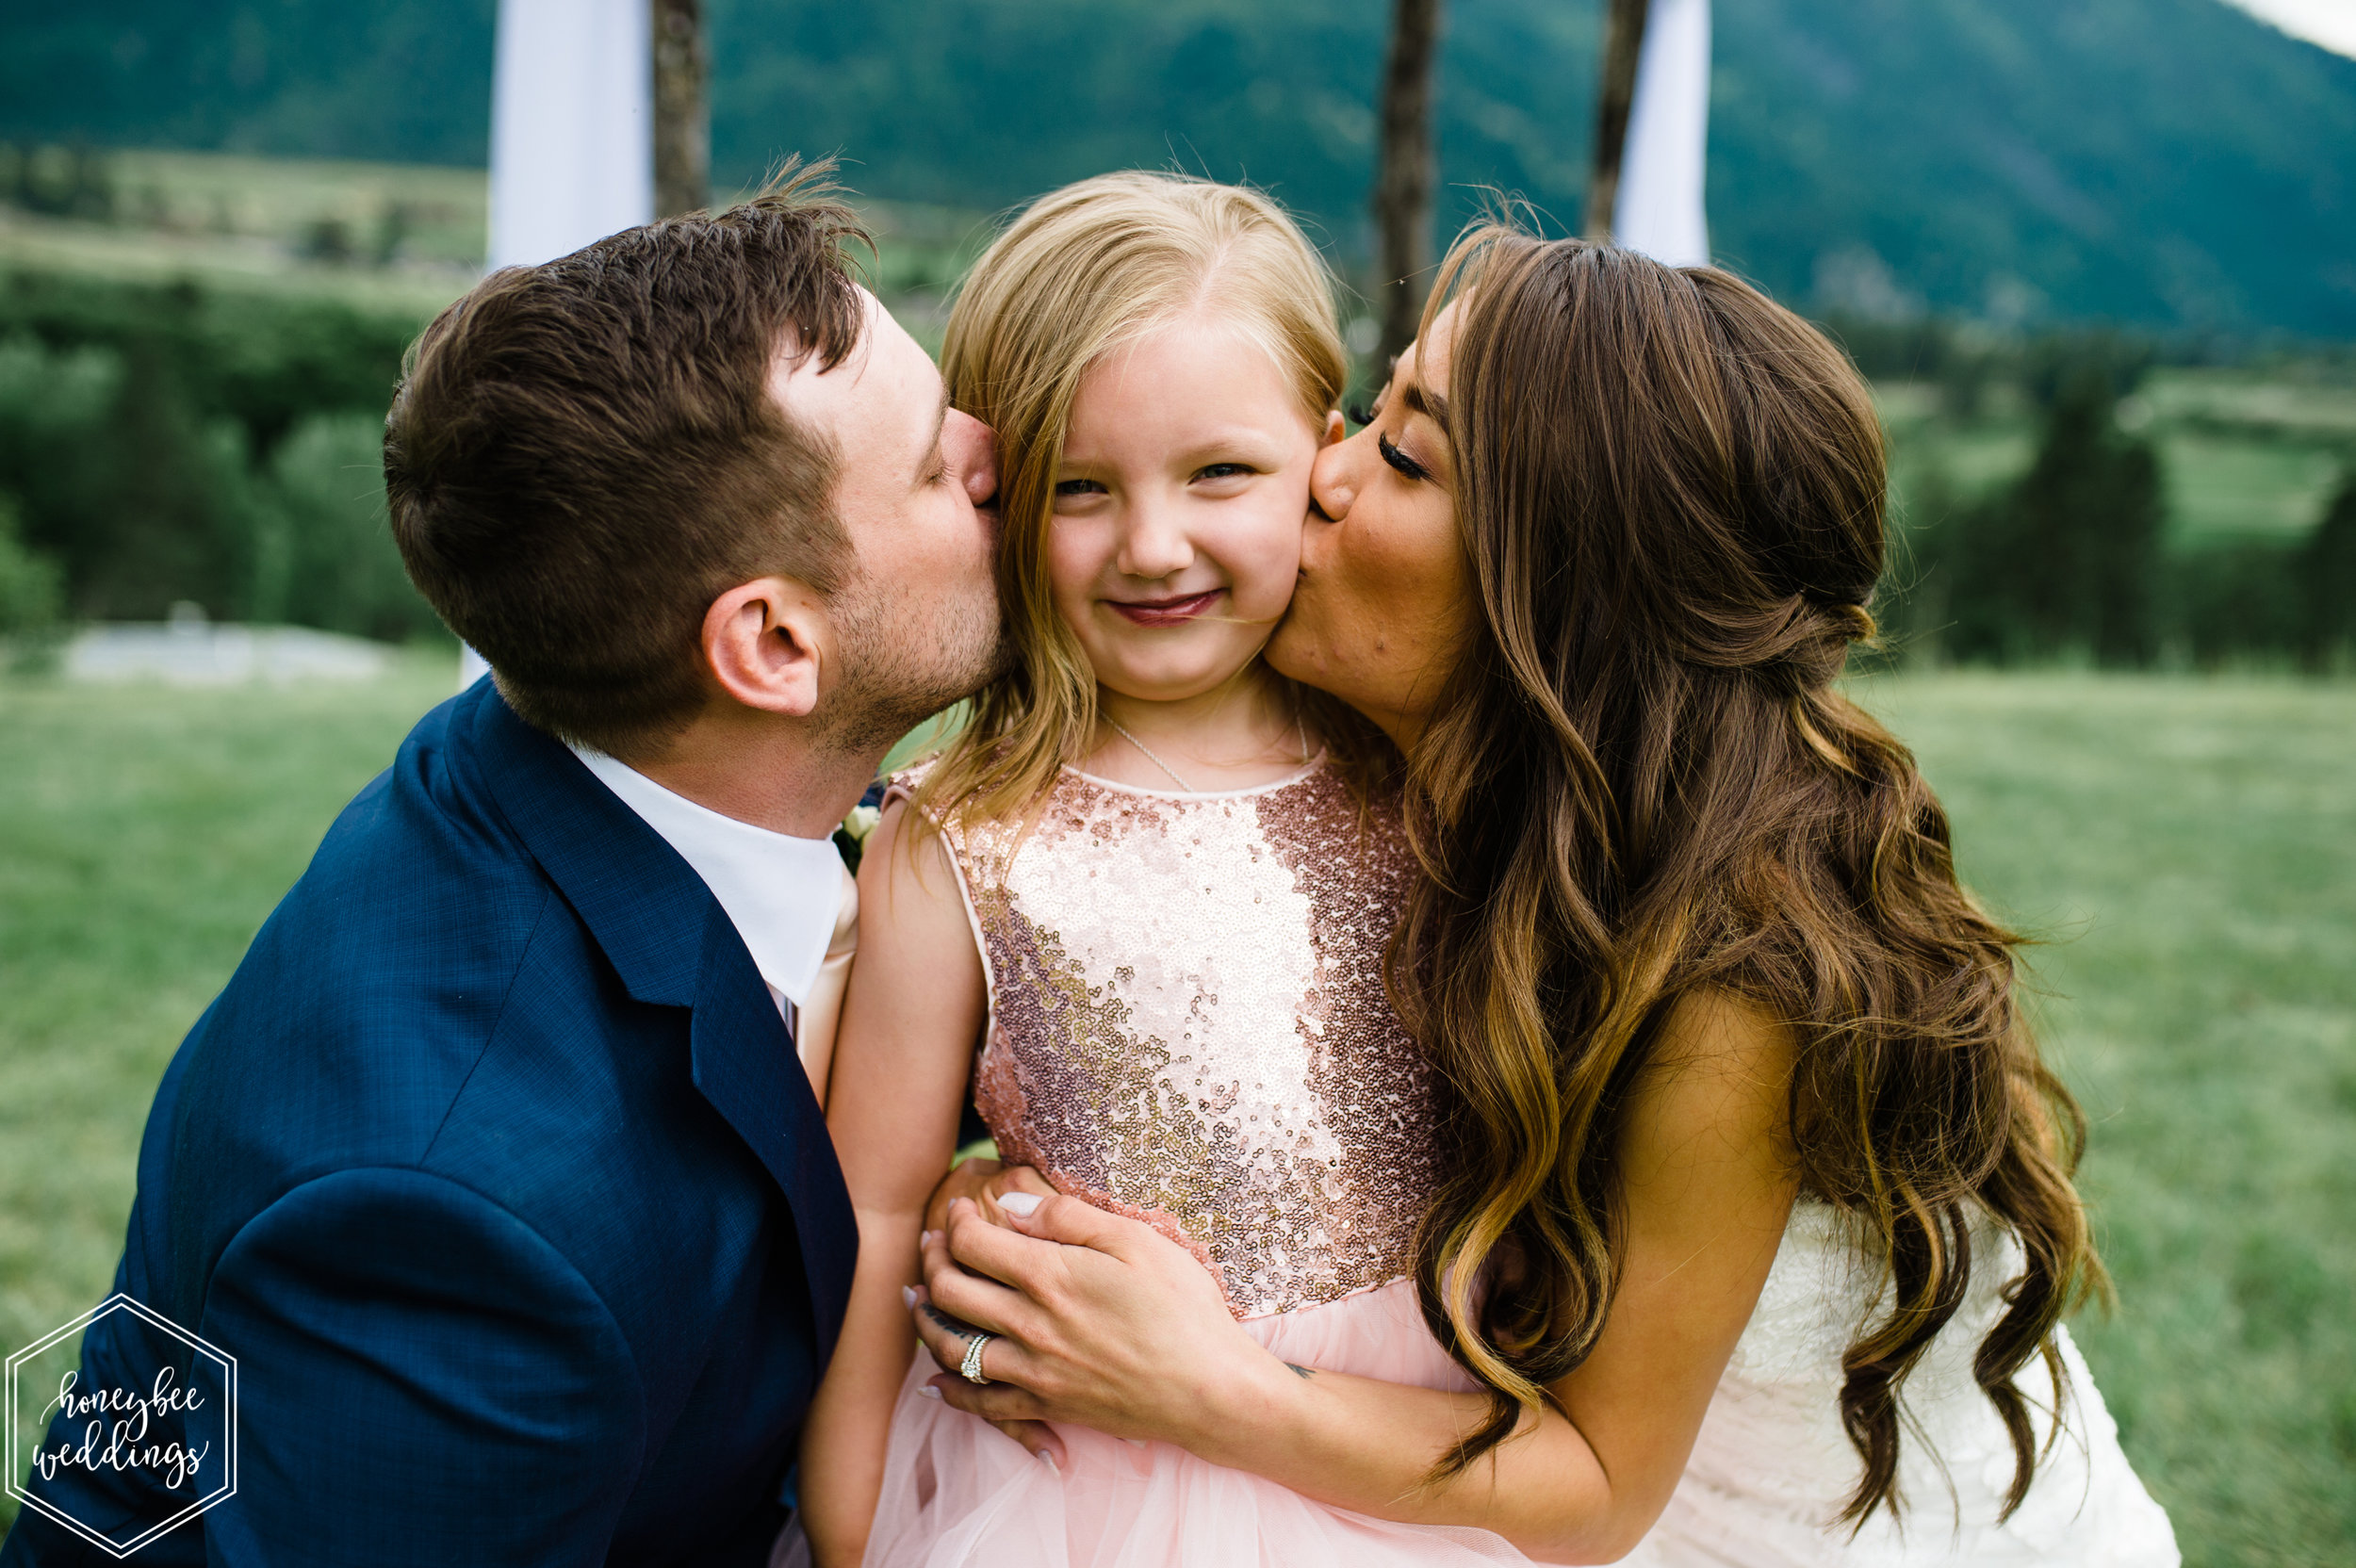 286Montana Wedding Photographer_Missoula Wedding_Honeybee Weddings_Devlin & Jacob_June 22, 2019-3212.jpg